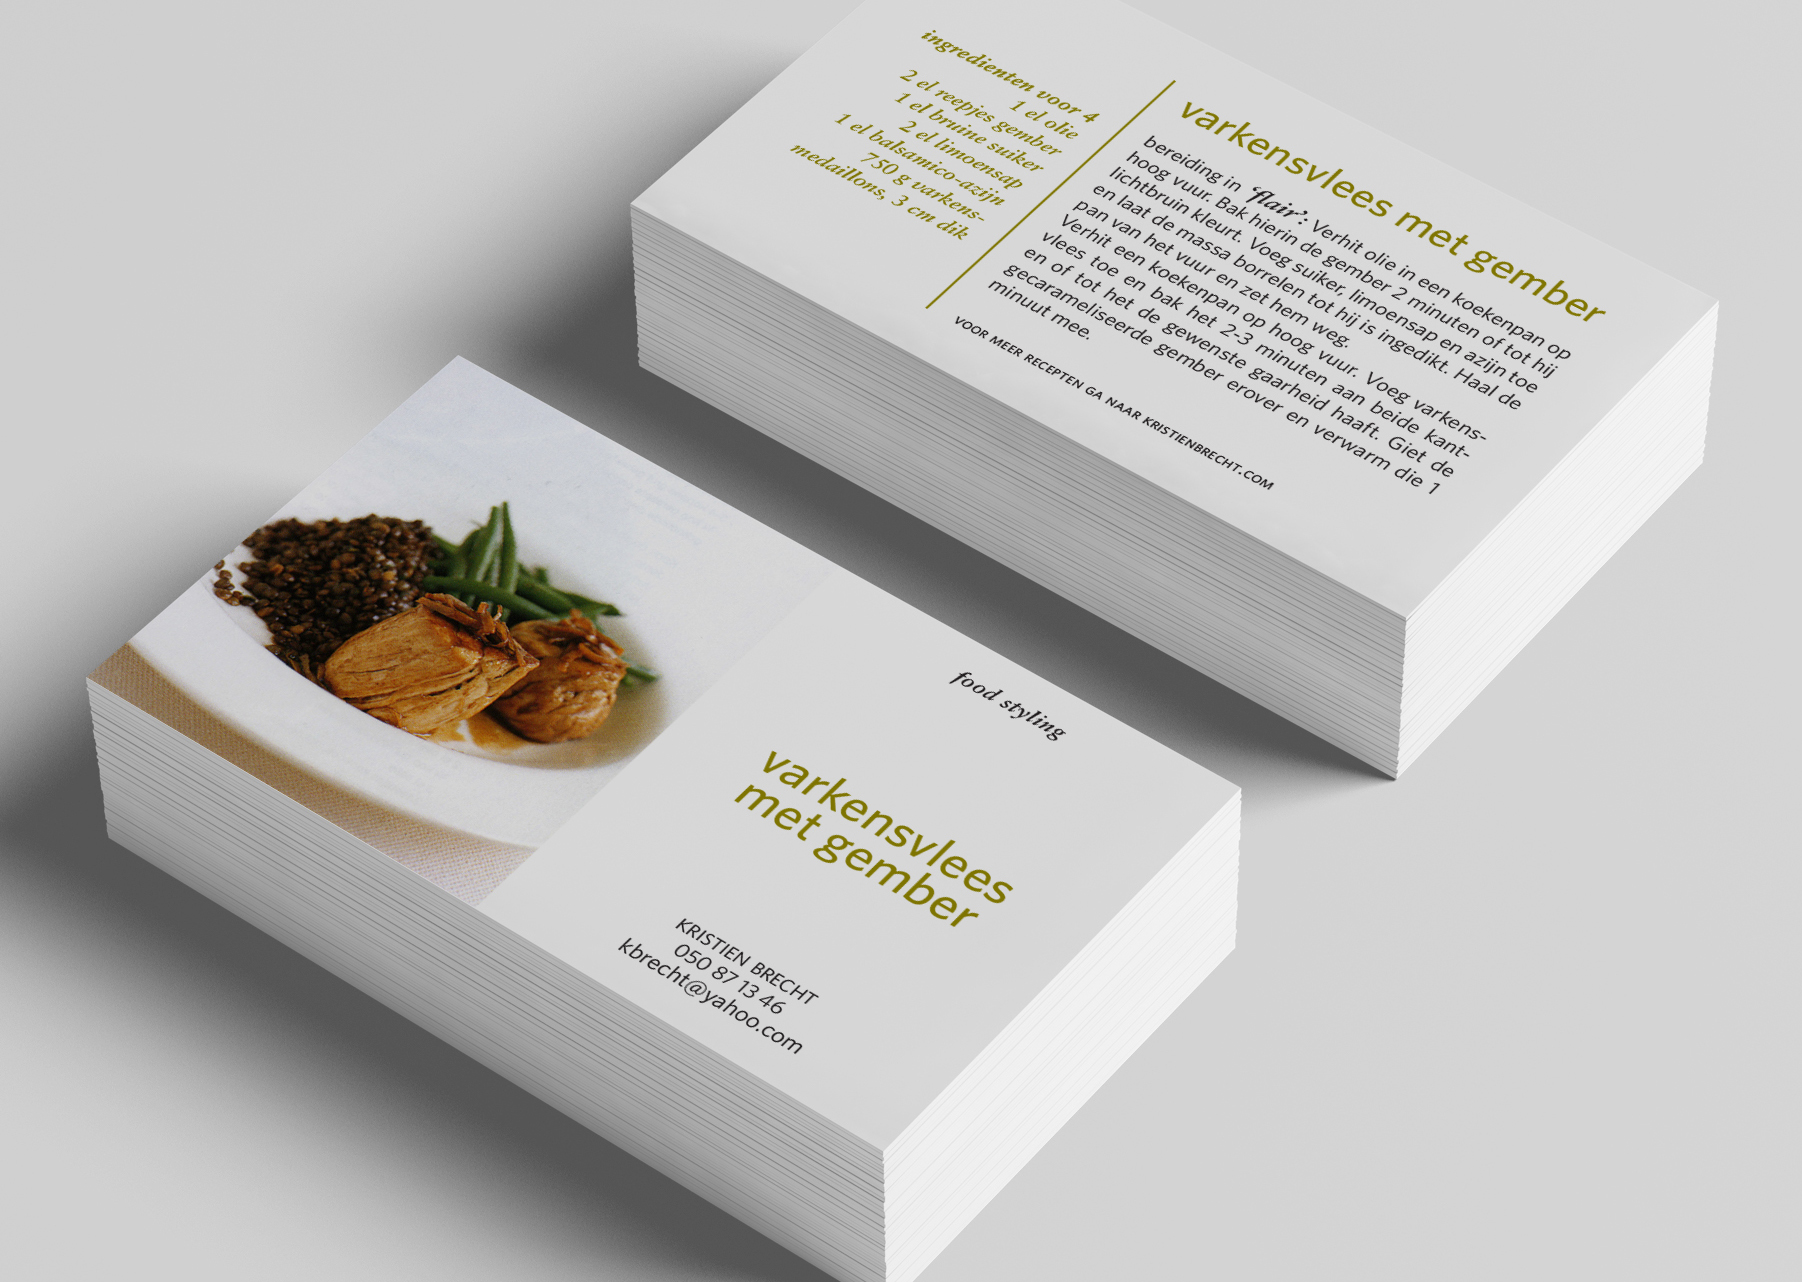 Recipe Card Crop3.jpg